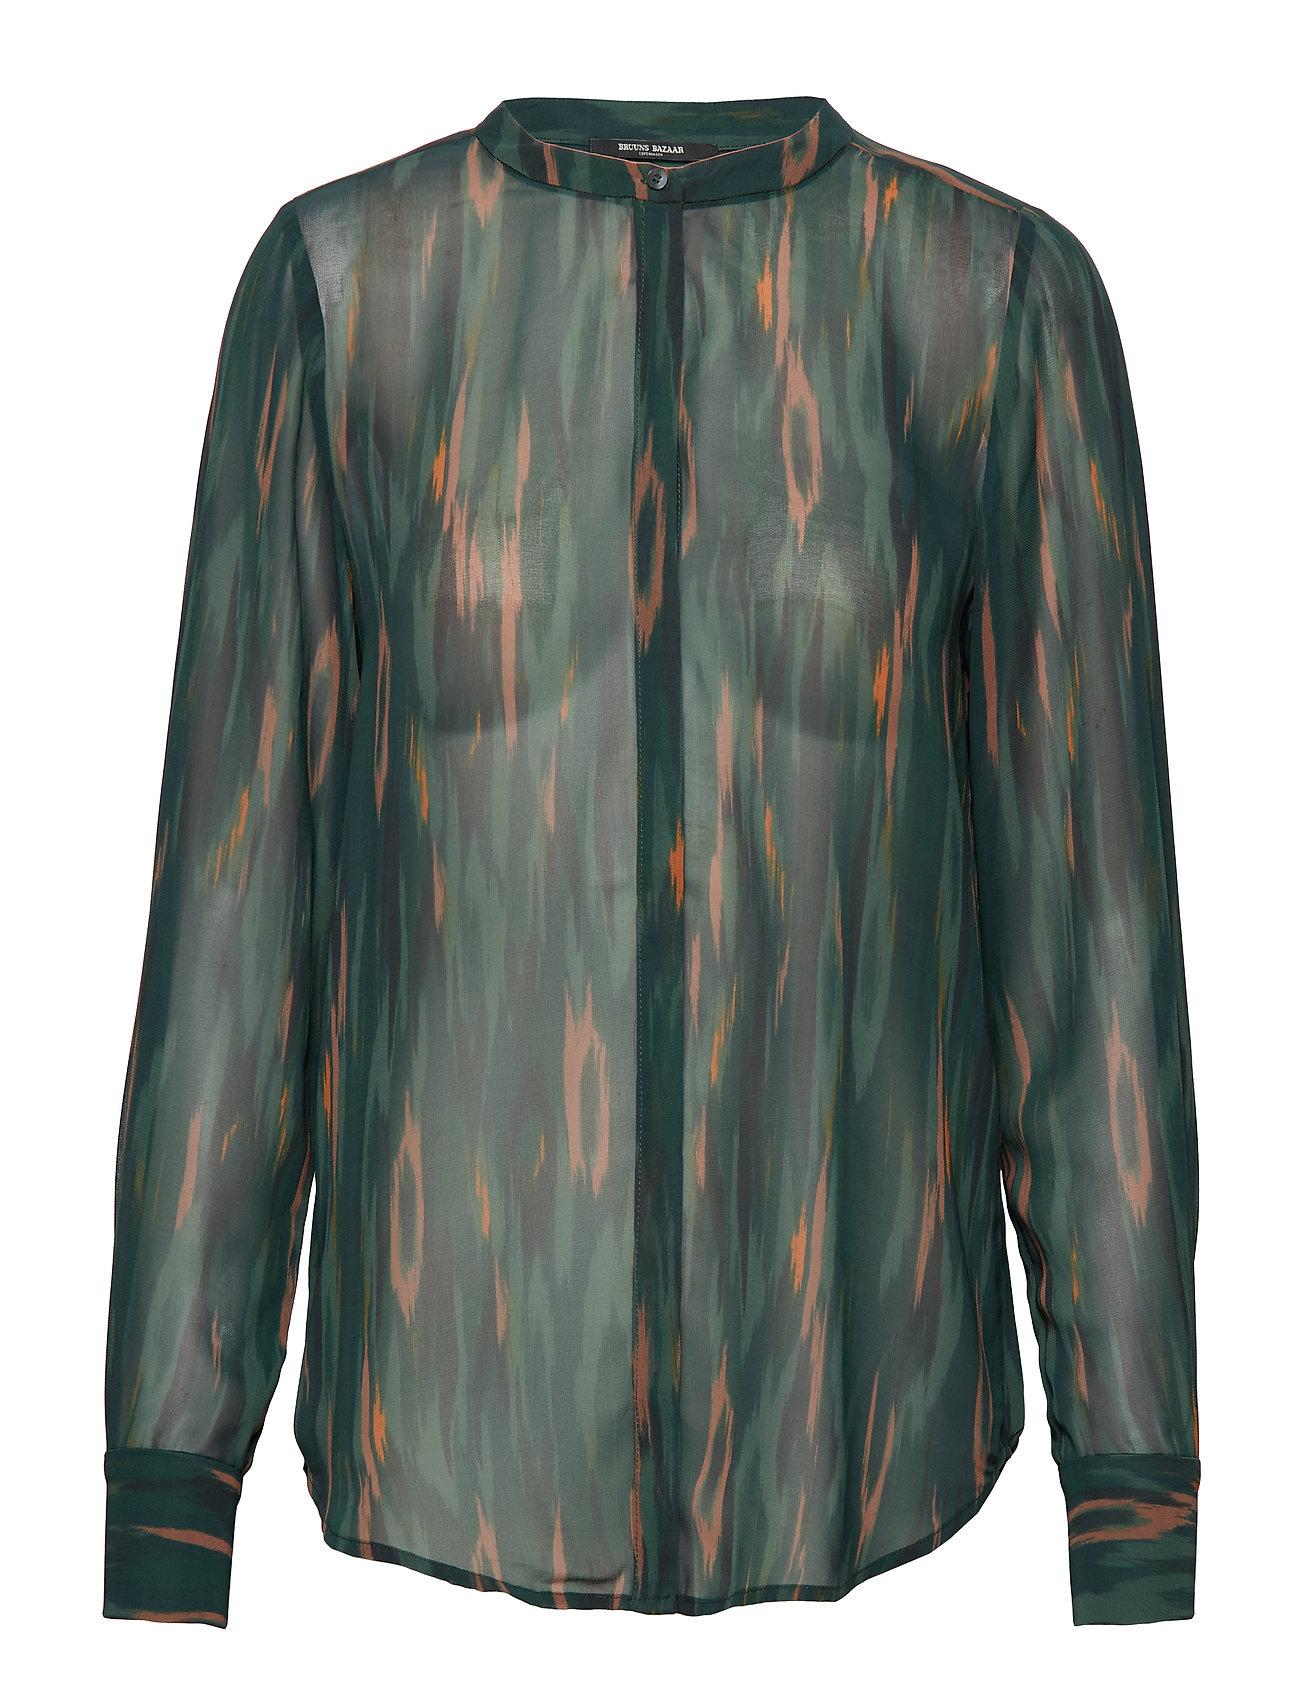 Bruuns Bazaar Camou Claire Shirt - DEEP FOREST - CAMOU ARTWORK